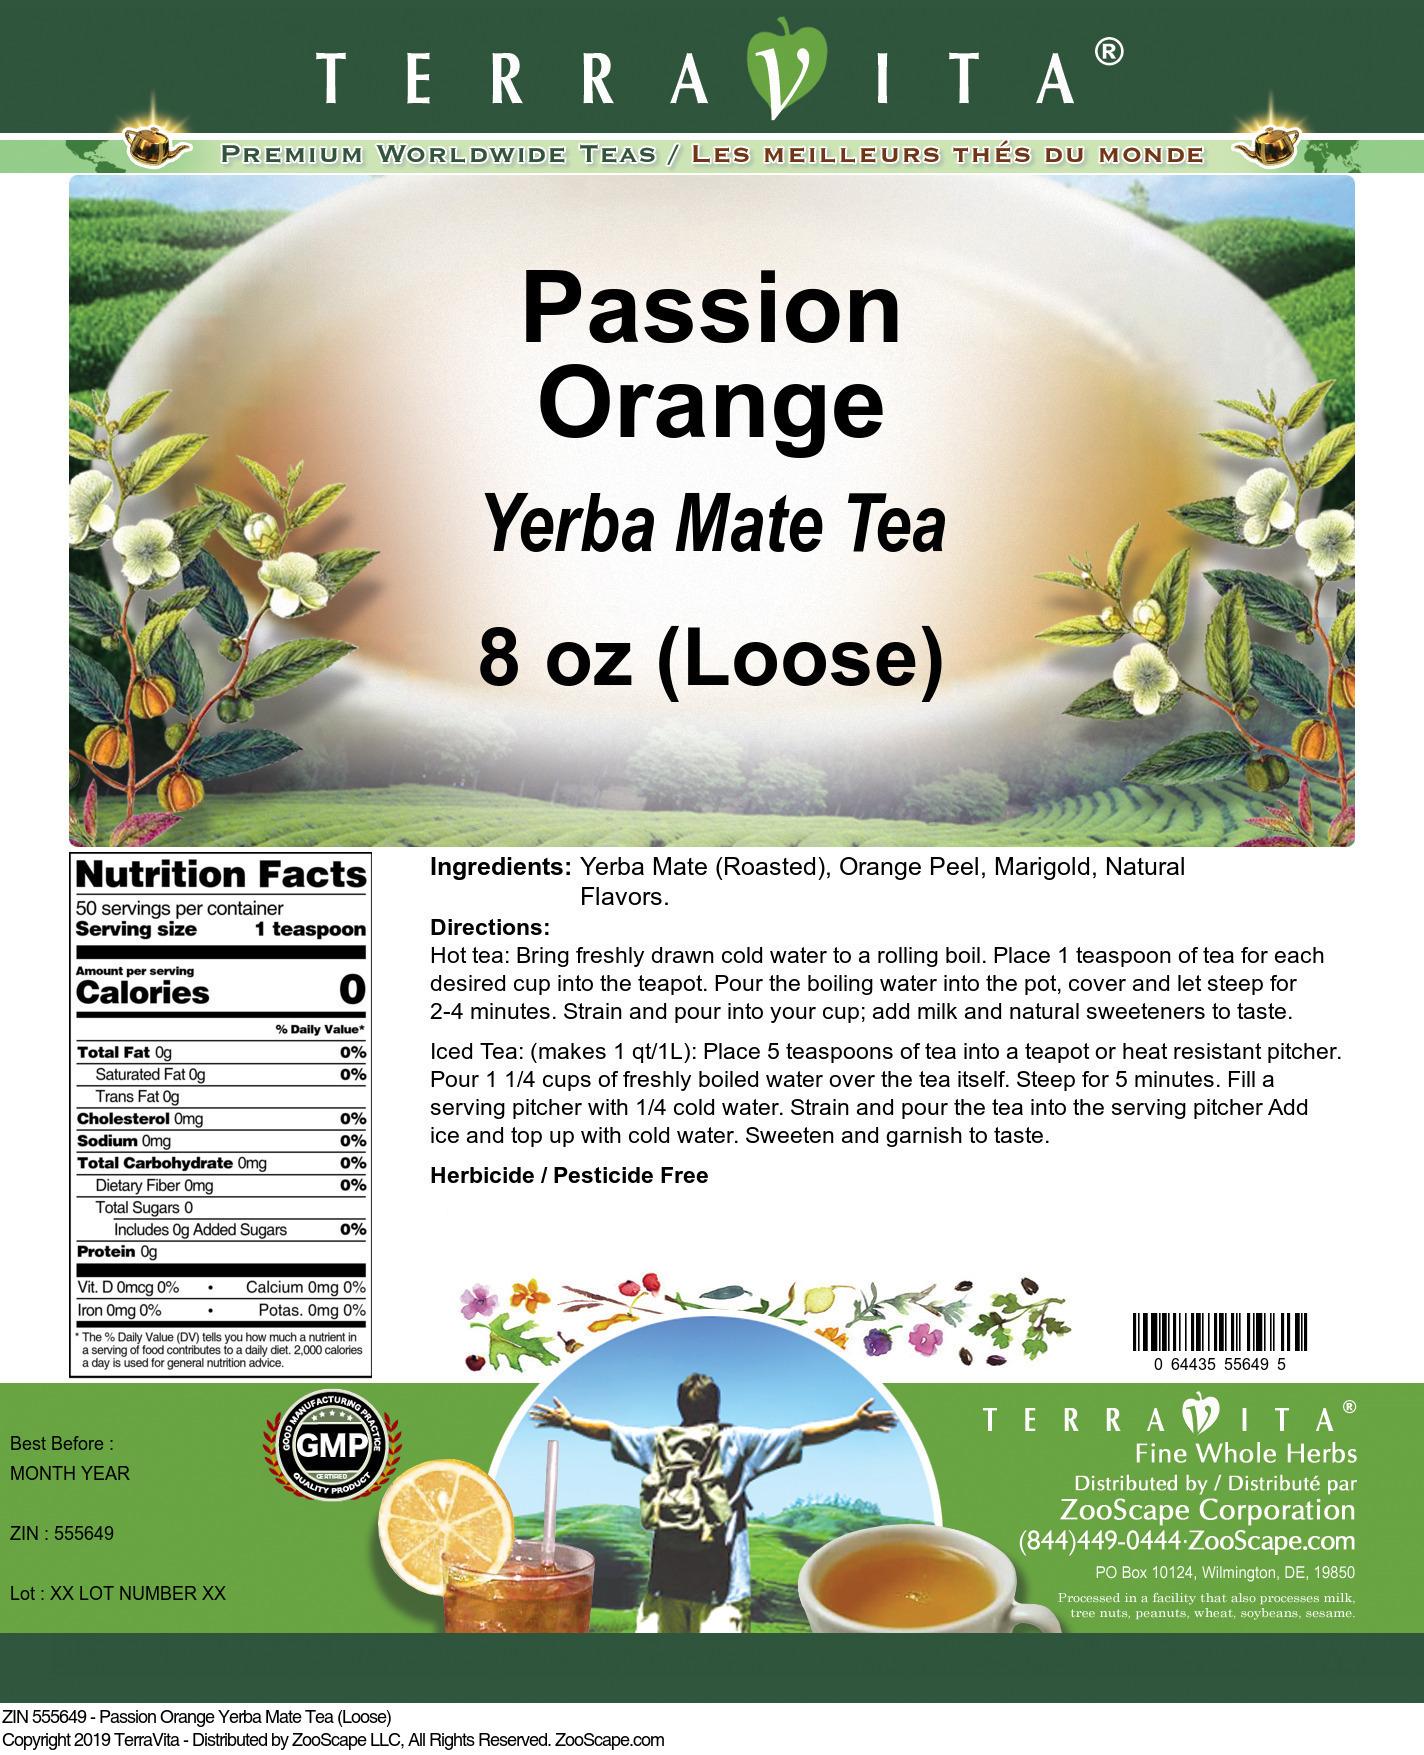 Passion Orange Yerba Mate